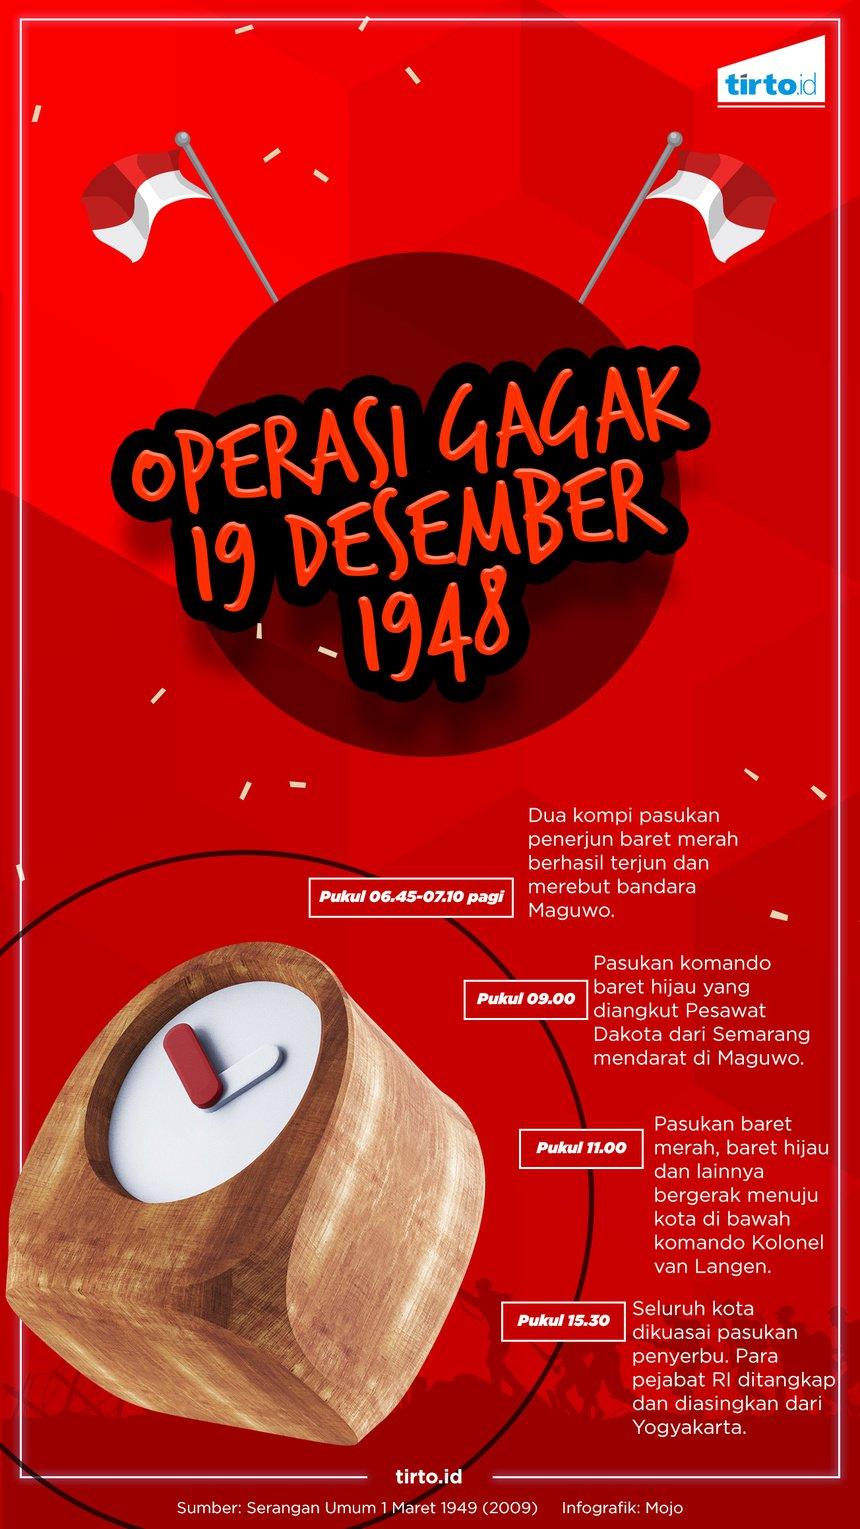 19 Desember 2016: 68 Tahun Agresi Militer II Operasi Gagak Menduduki Ibukota Republik